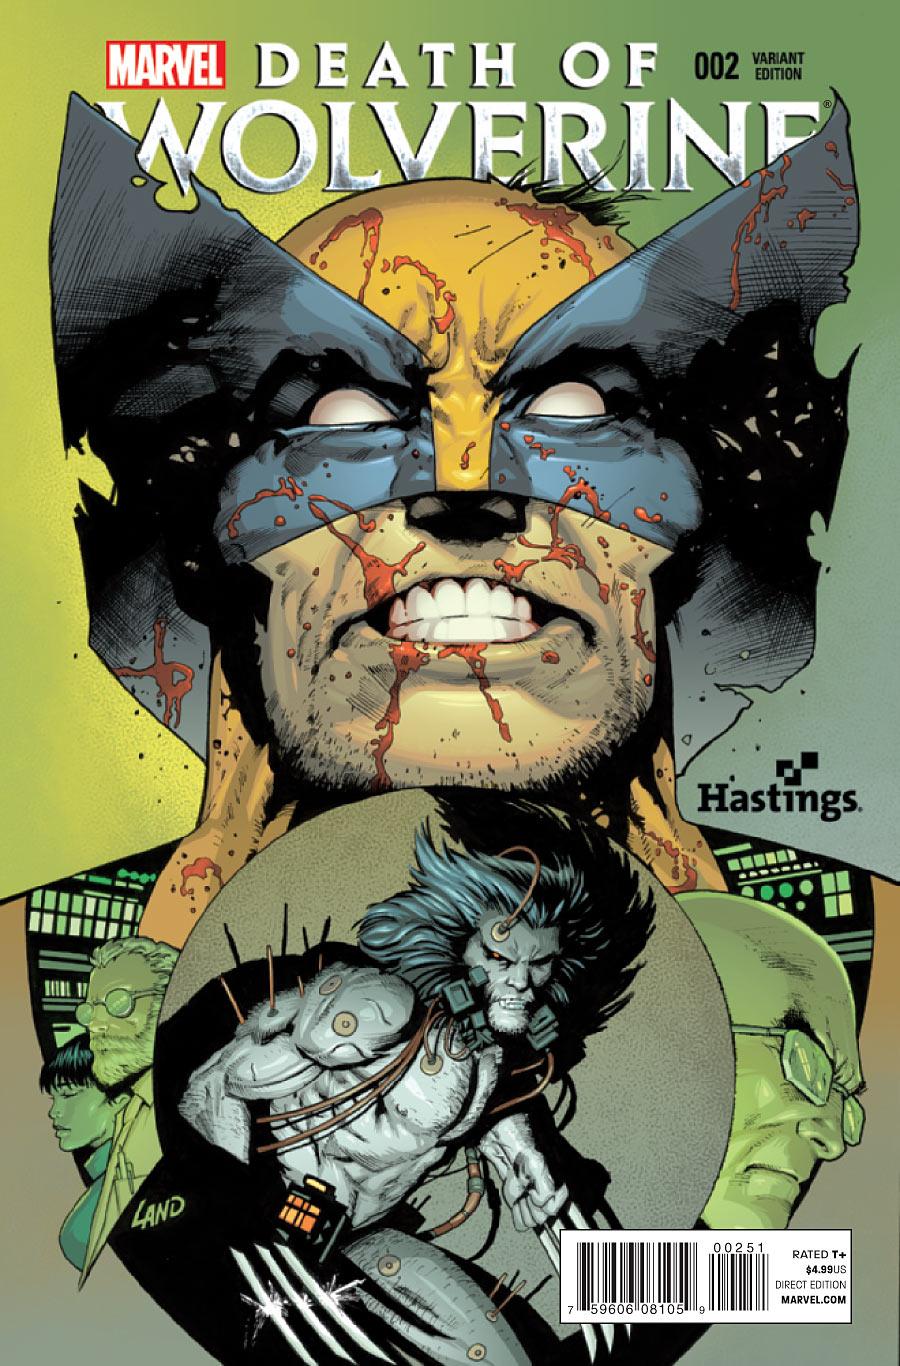 La Mort de Wolverine 2 - Death of Wolverine Part Two (Hastings Variant Cover)